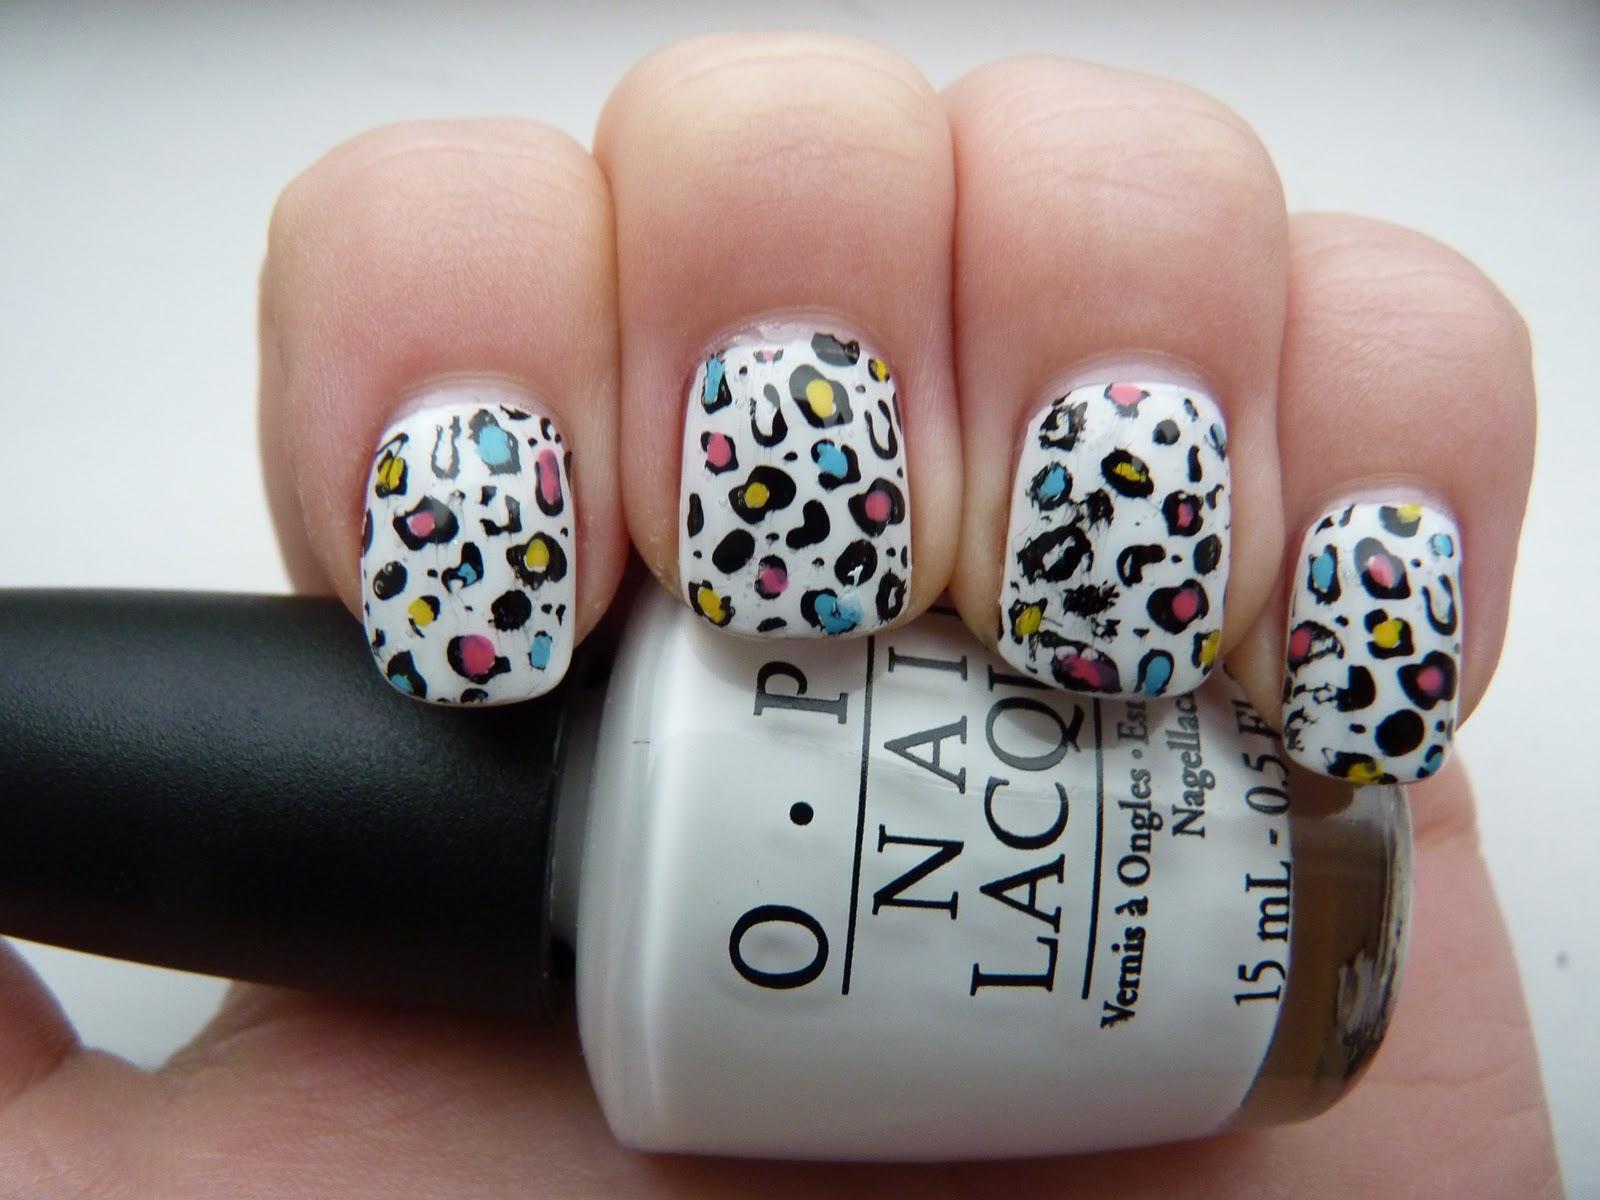 Colorful leopard print nails - HD Wallpaper Pic